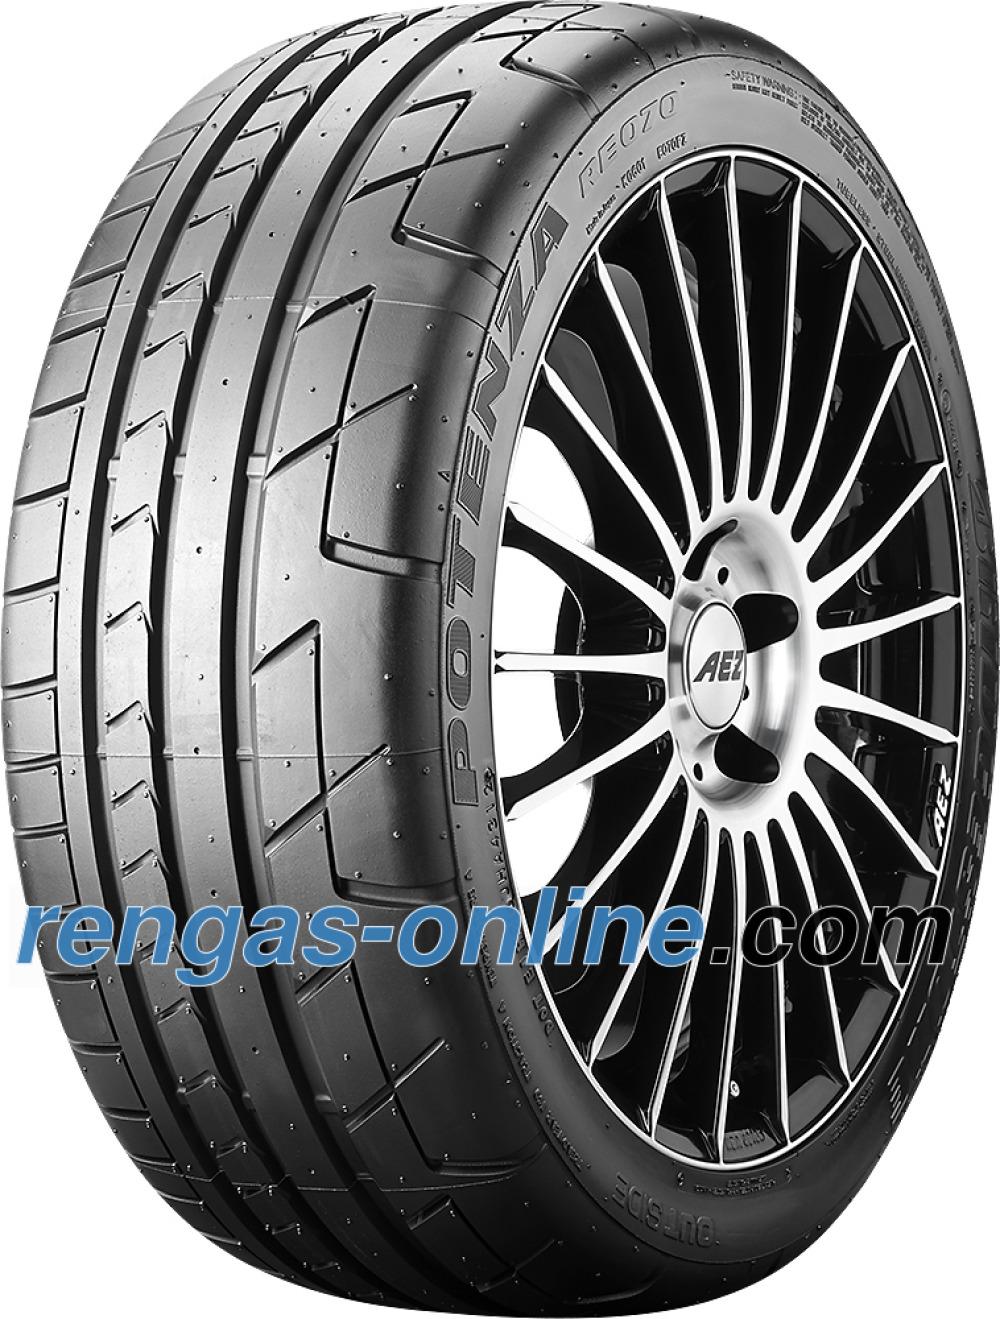 bridgestone-potenza-re-070-r-rft-28535-zr20-100y-runflat